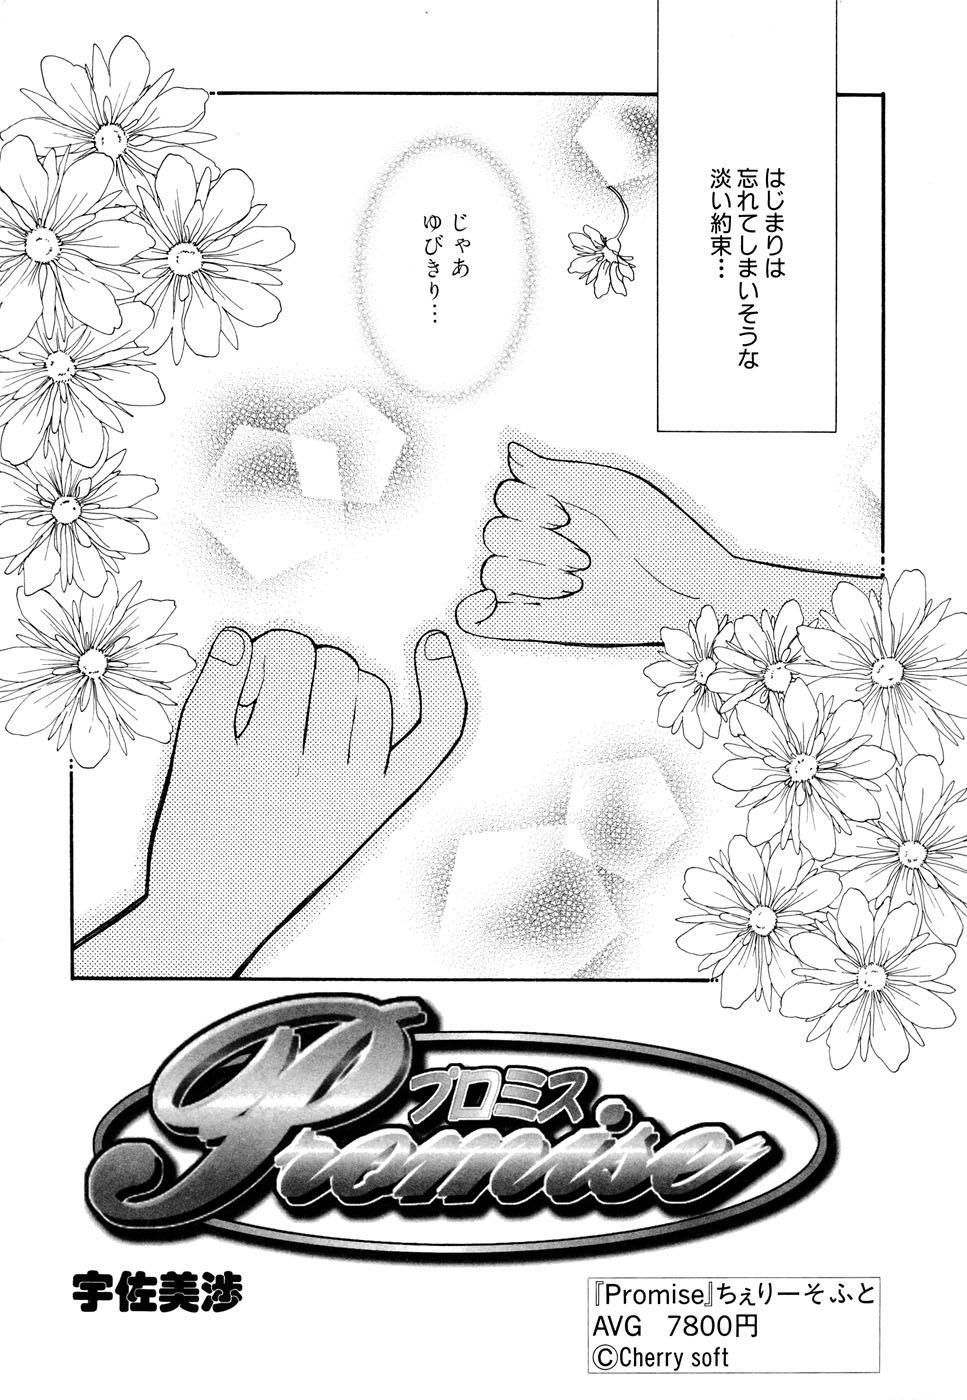 G-drive Vol.1 Ryoujokuhen 80